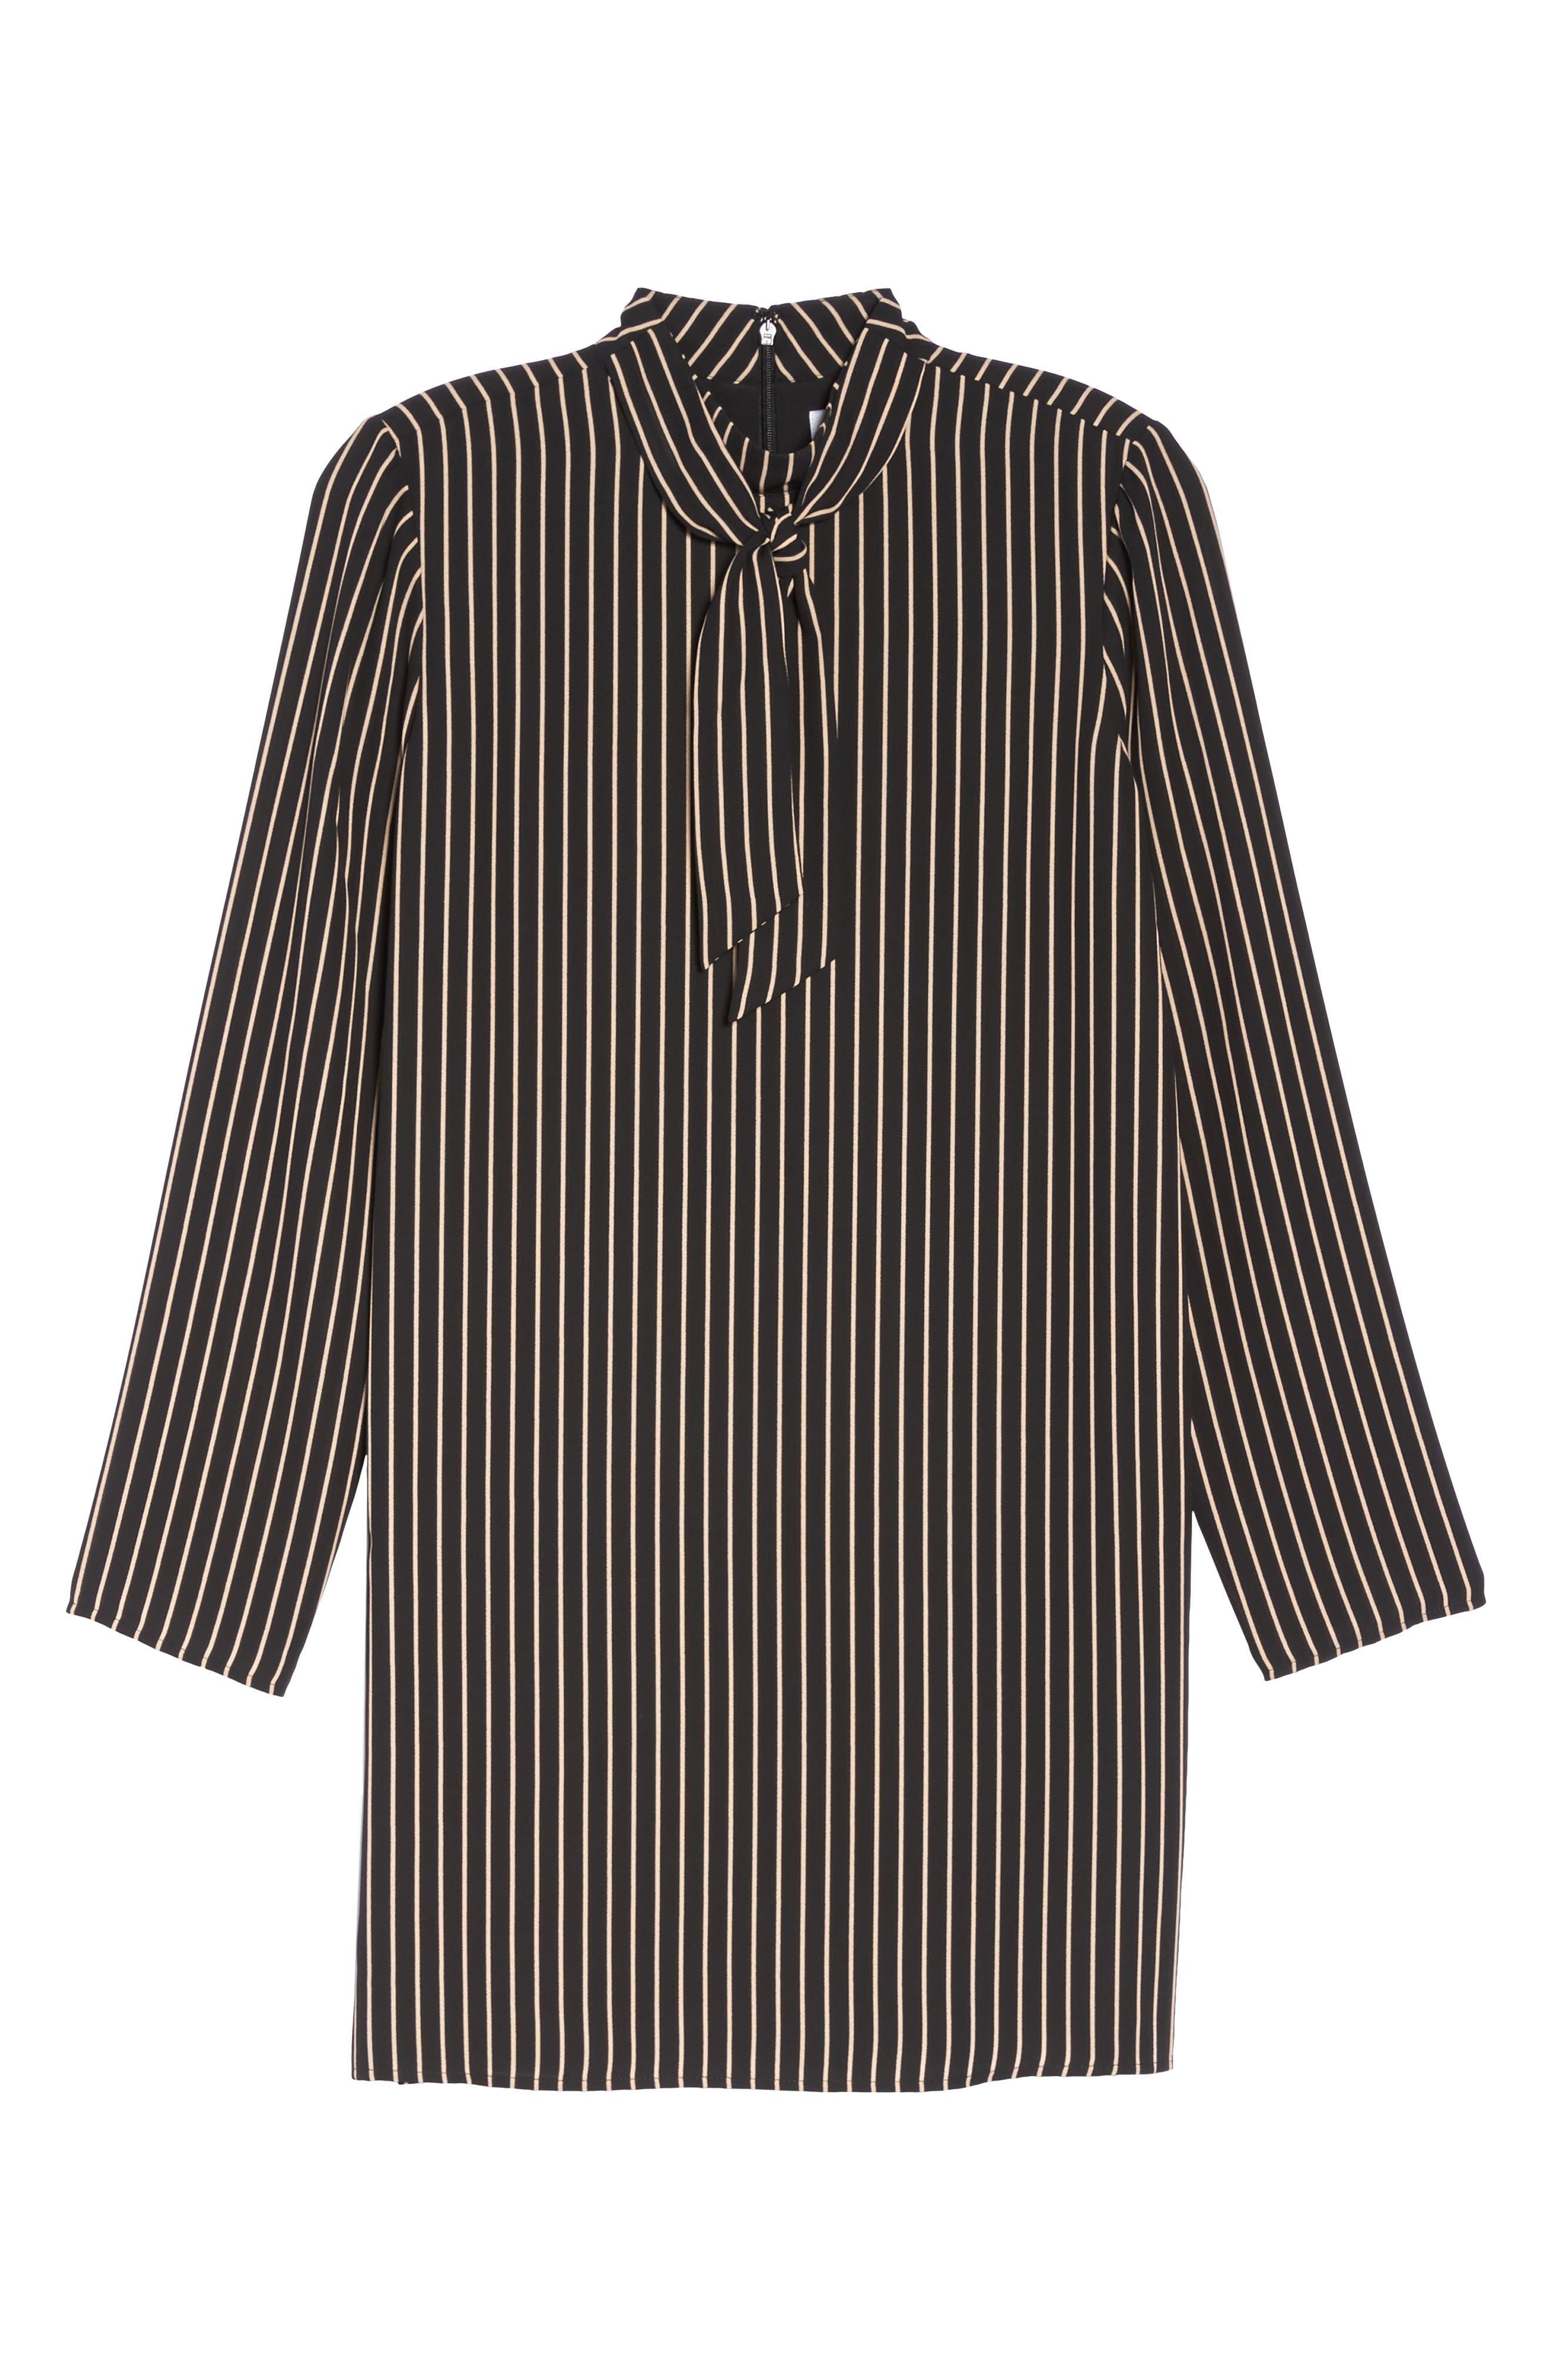 She-E-O Shift Dress,                             Alternate thumbnail 6, color,                             010